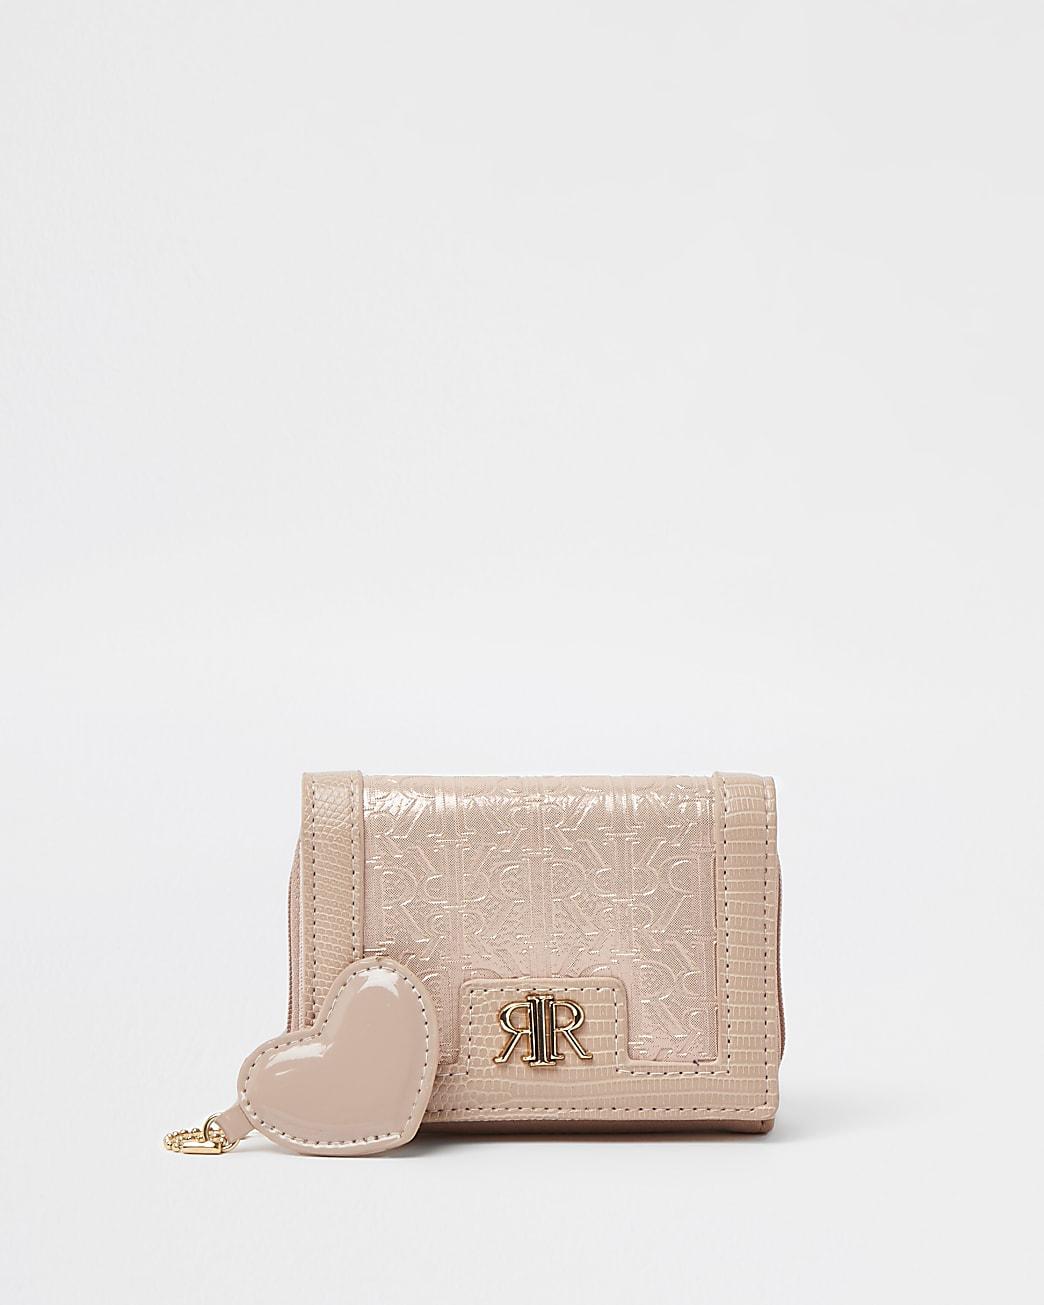 Girls pink RIR patent purse